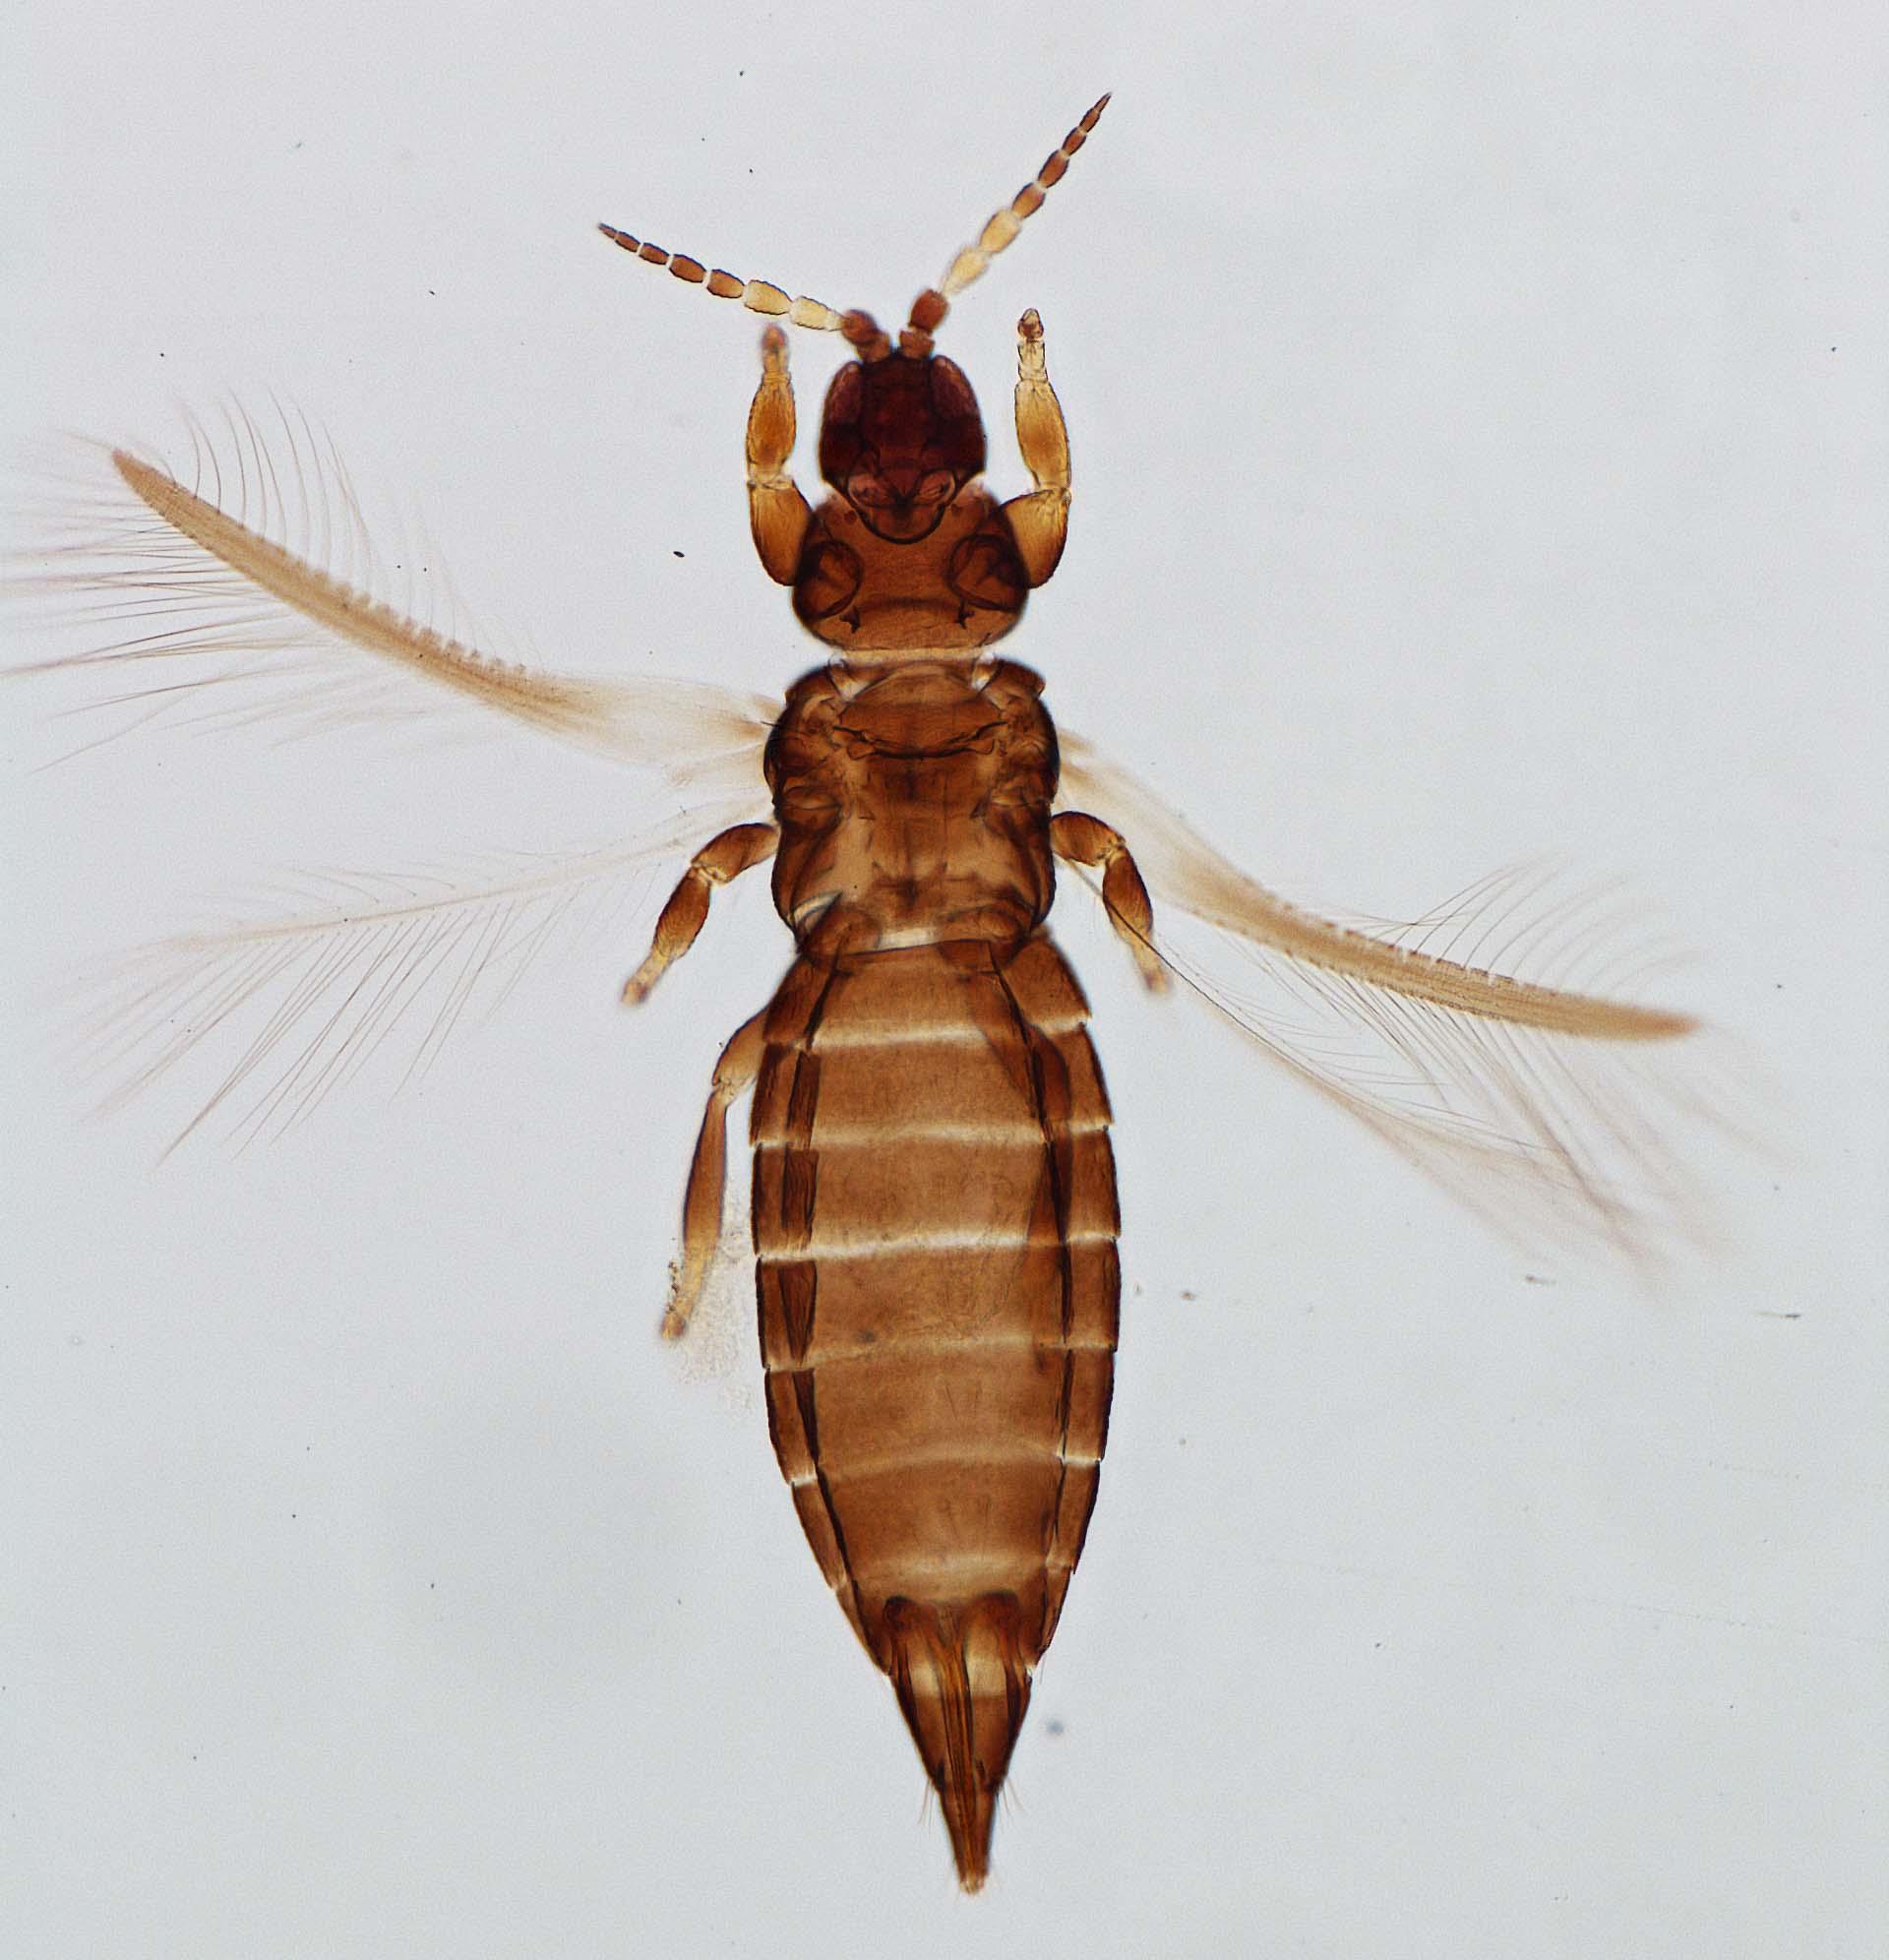 Heterothrips australis